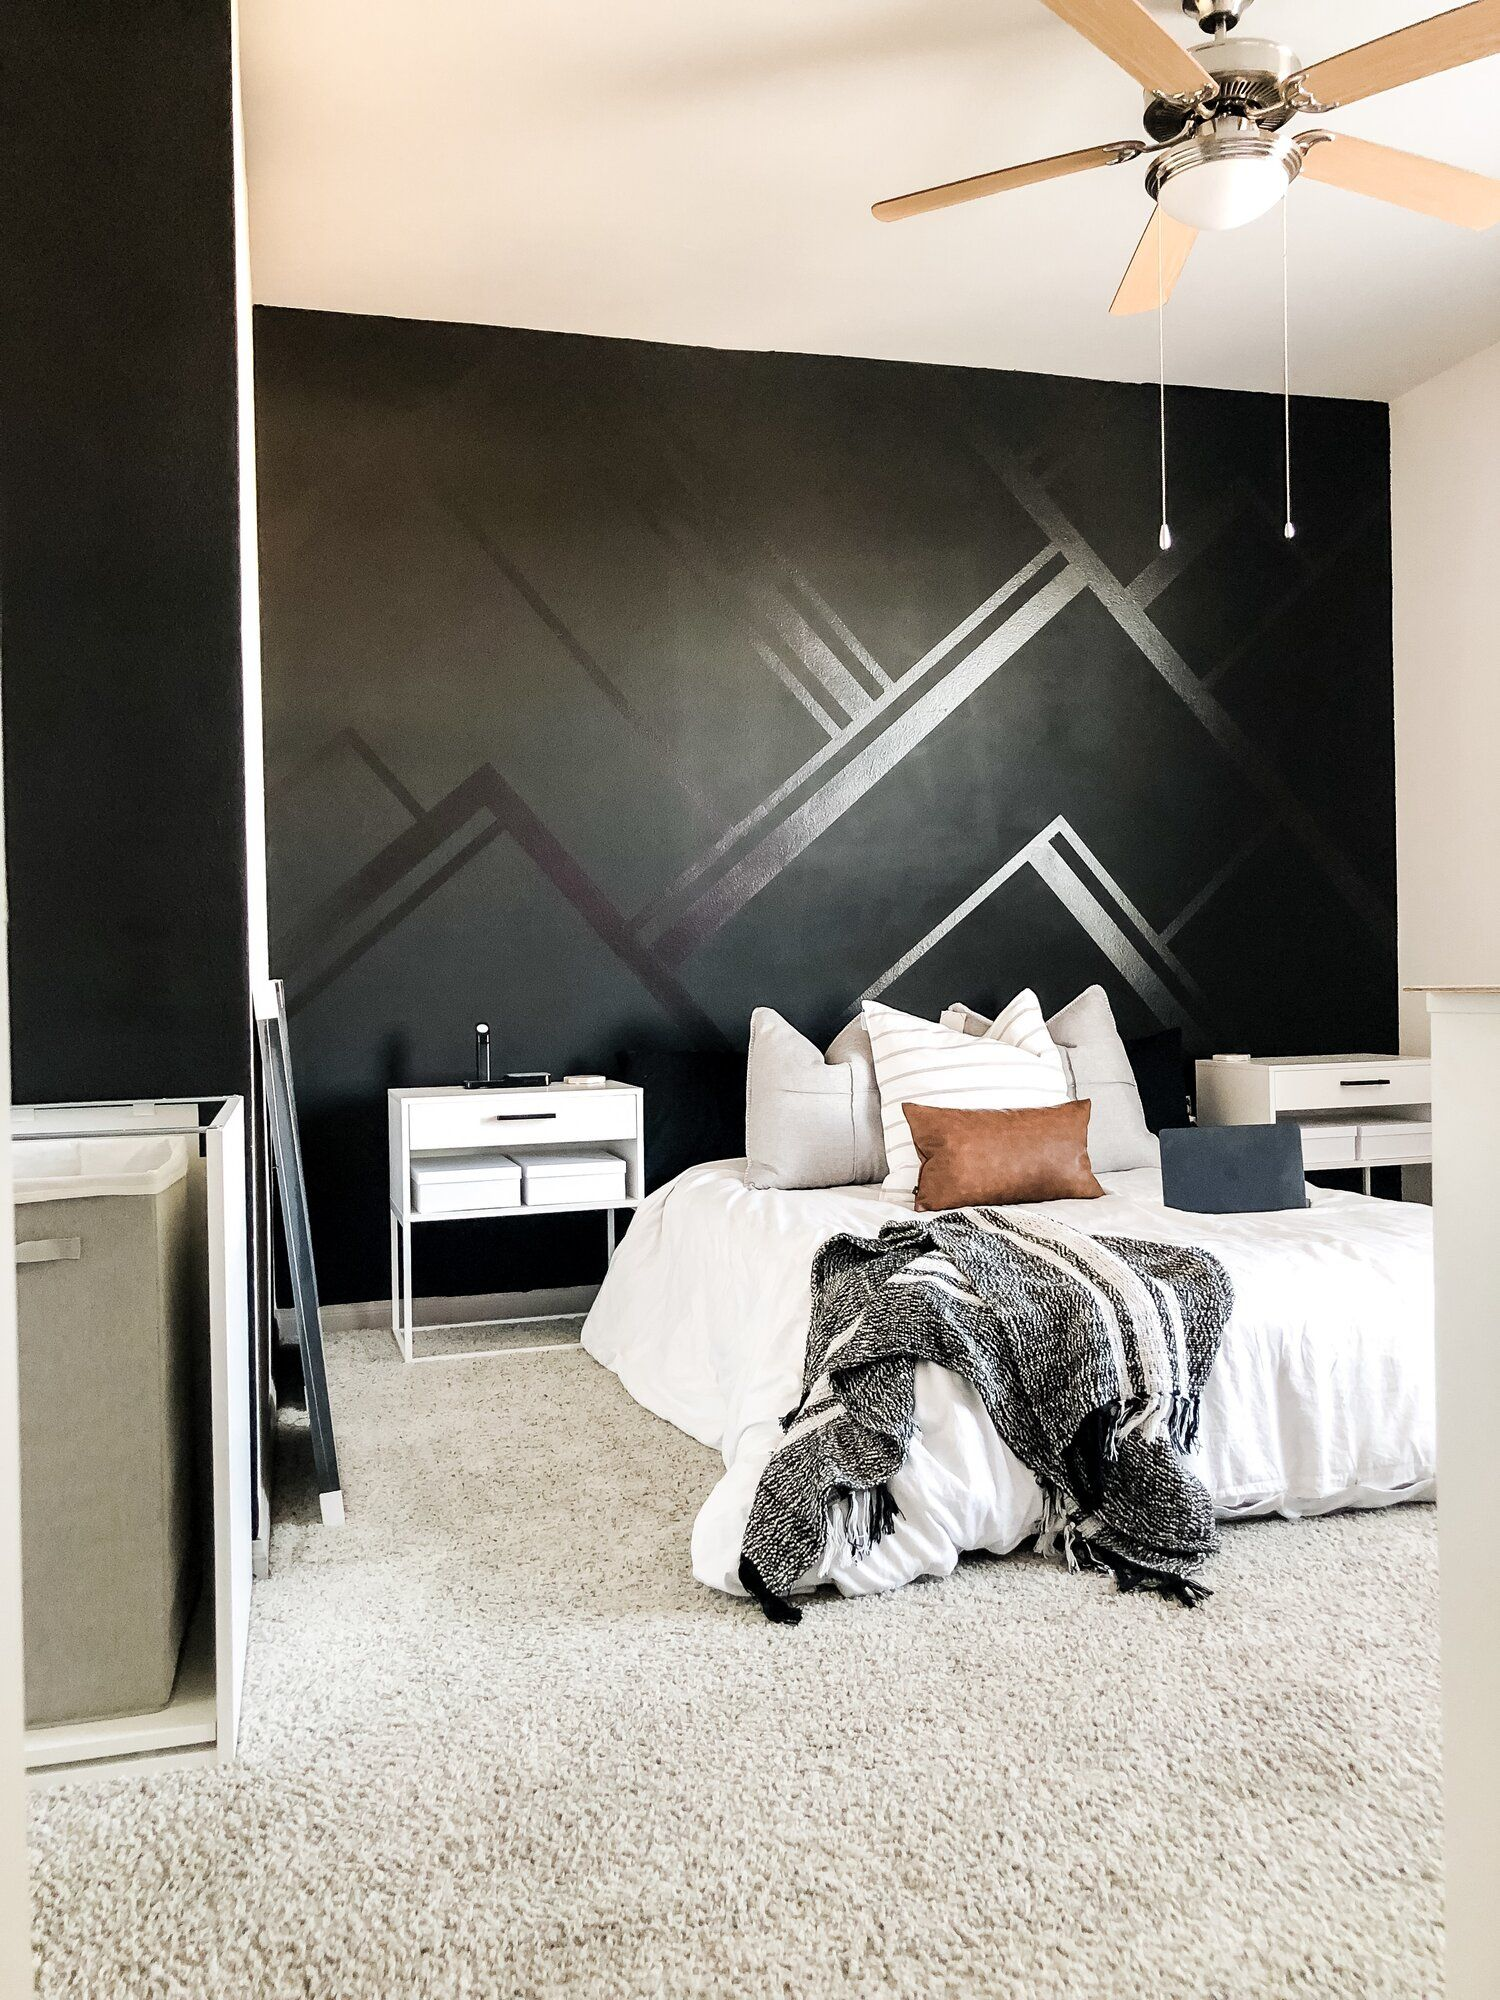 Orc Master Bedroom Makeover Week 3 Update Kayla Simone Home Bedroom Paint Design Accent Wall Bedroom Paint Black Walls Bedroom